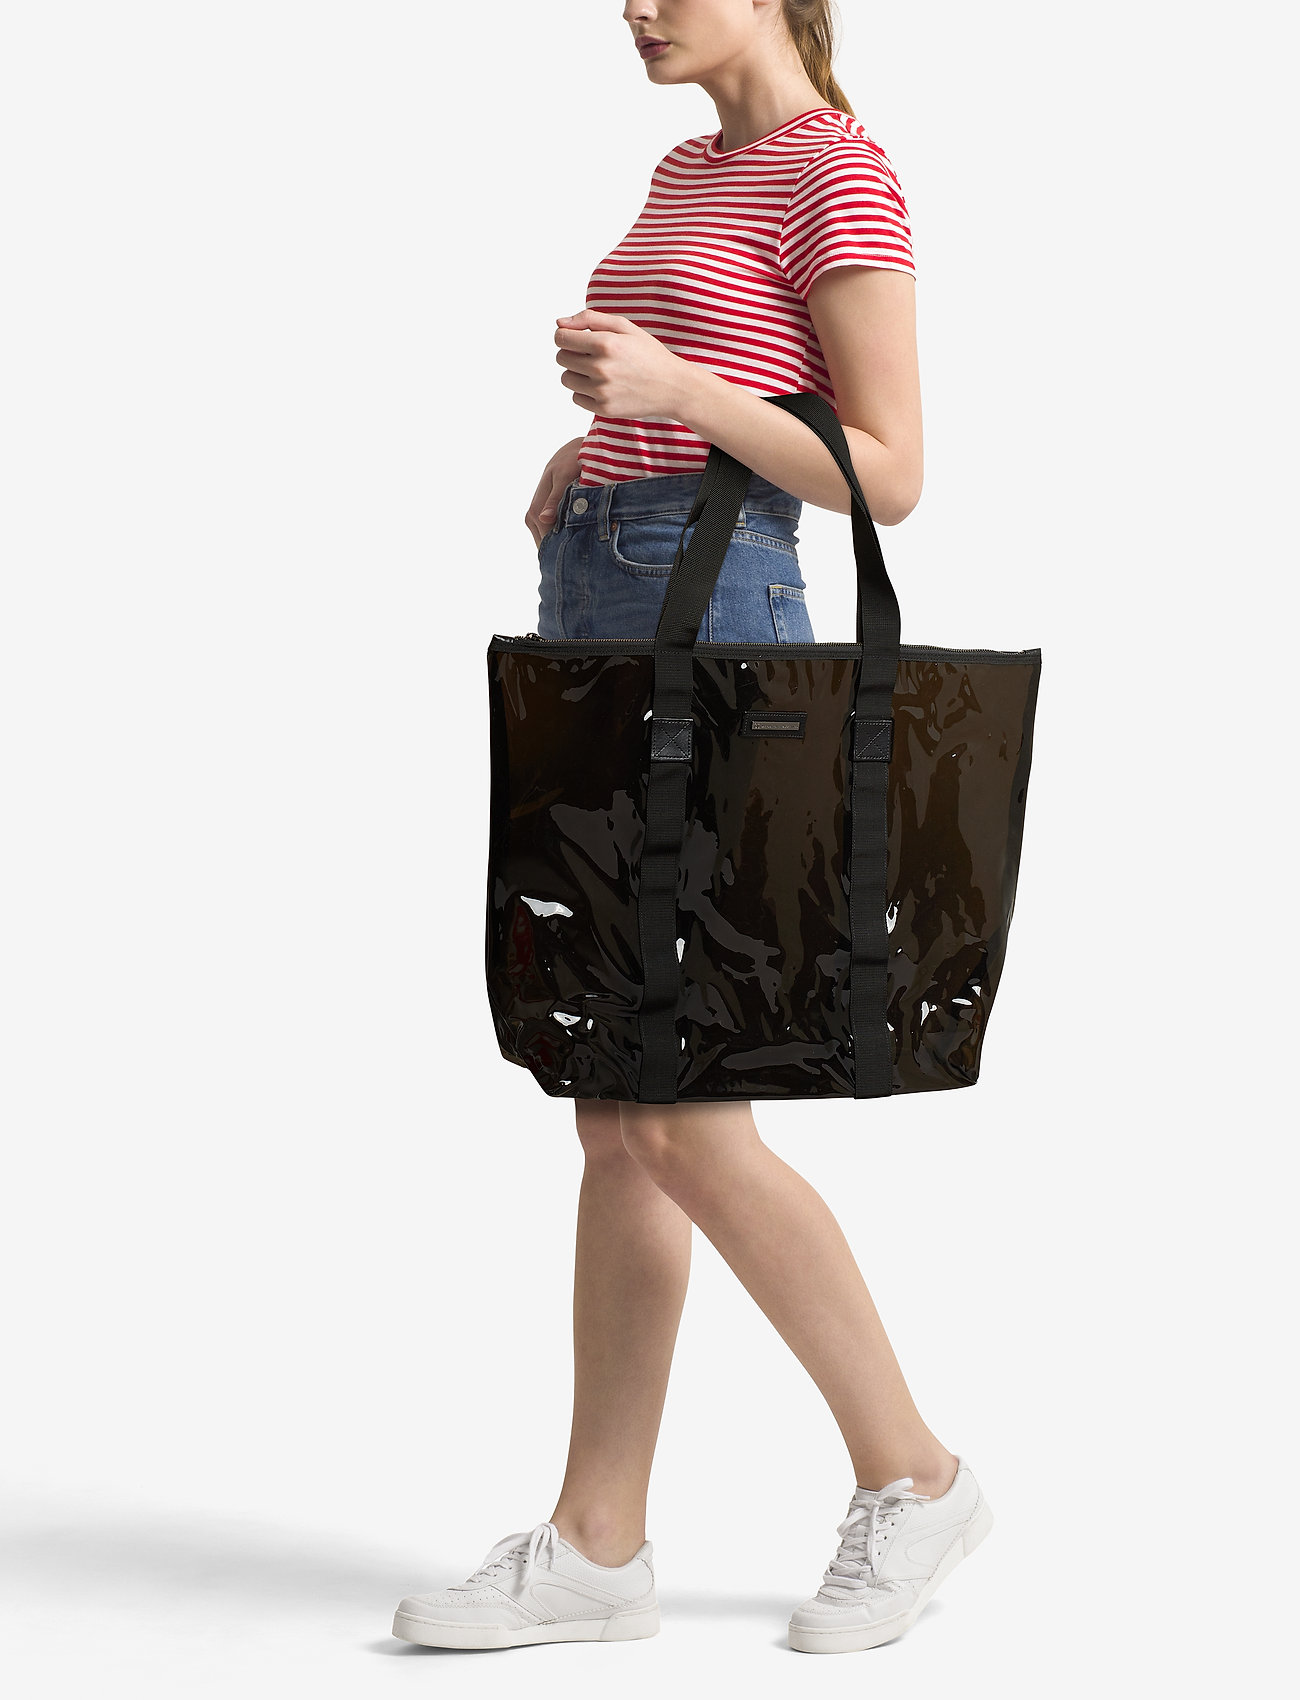 DAY et Day GW Transparent Bag